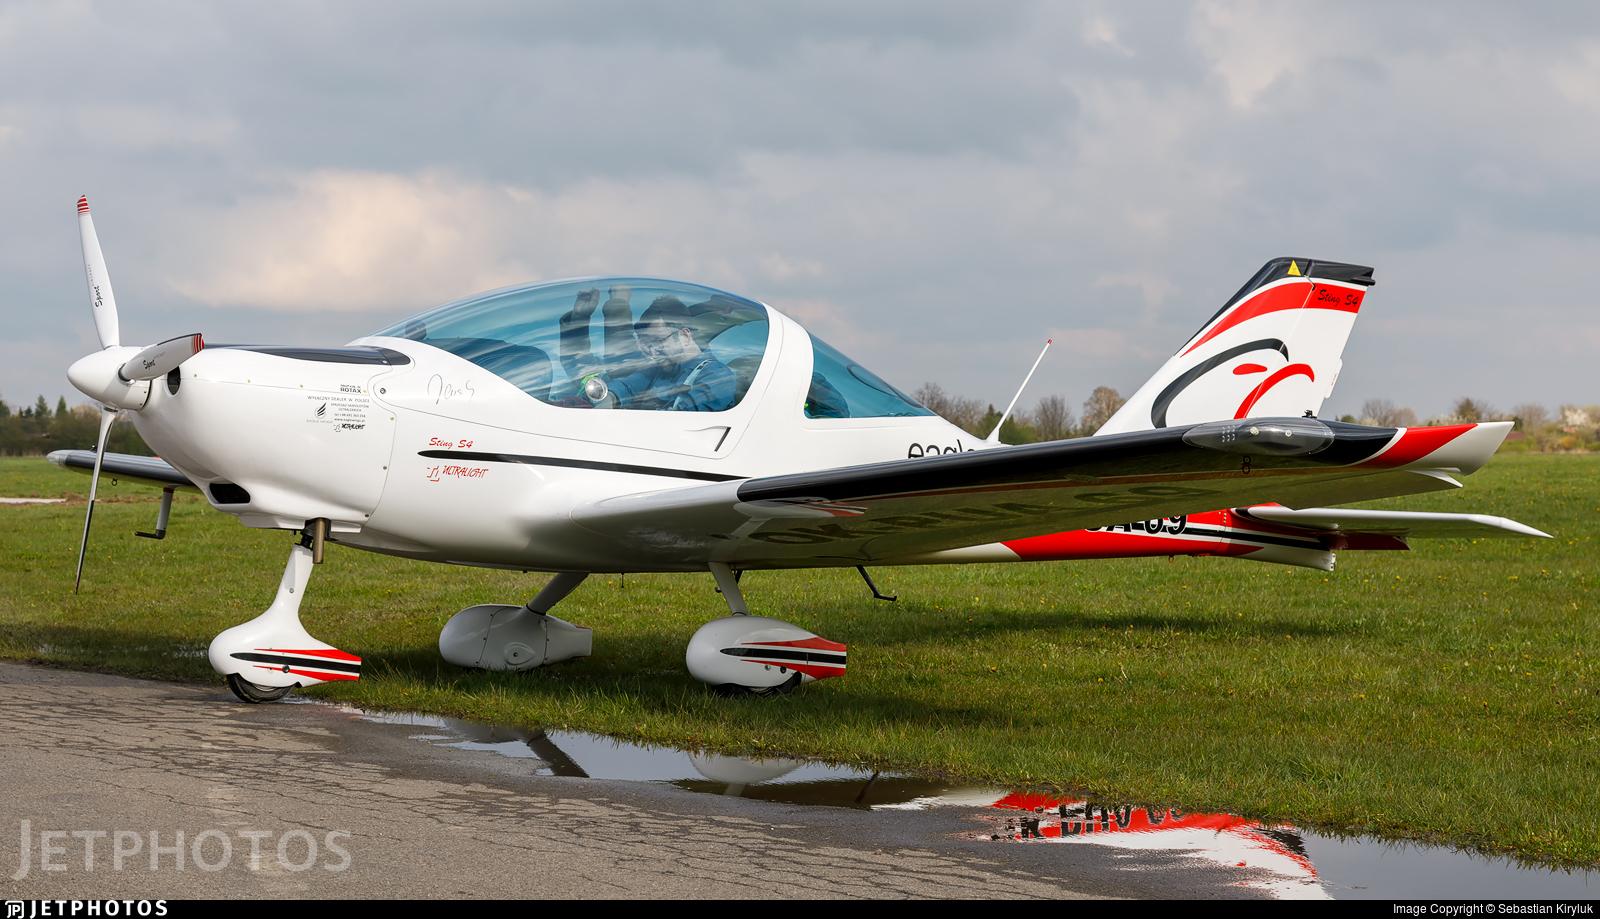 OK-PUA69 - TL Ultralight TL-2000 Sting S4 - Private